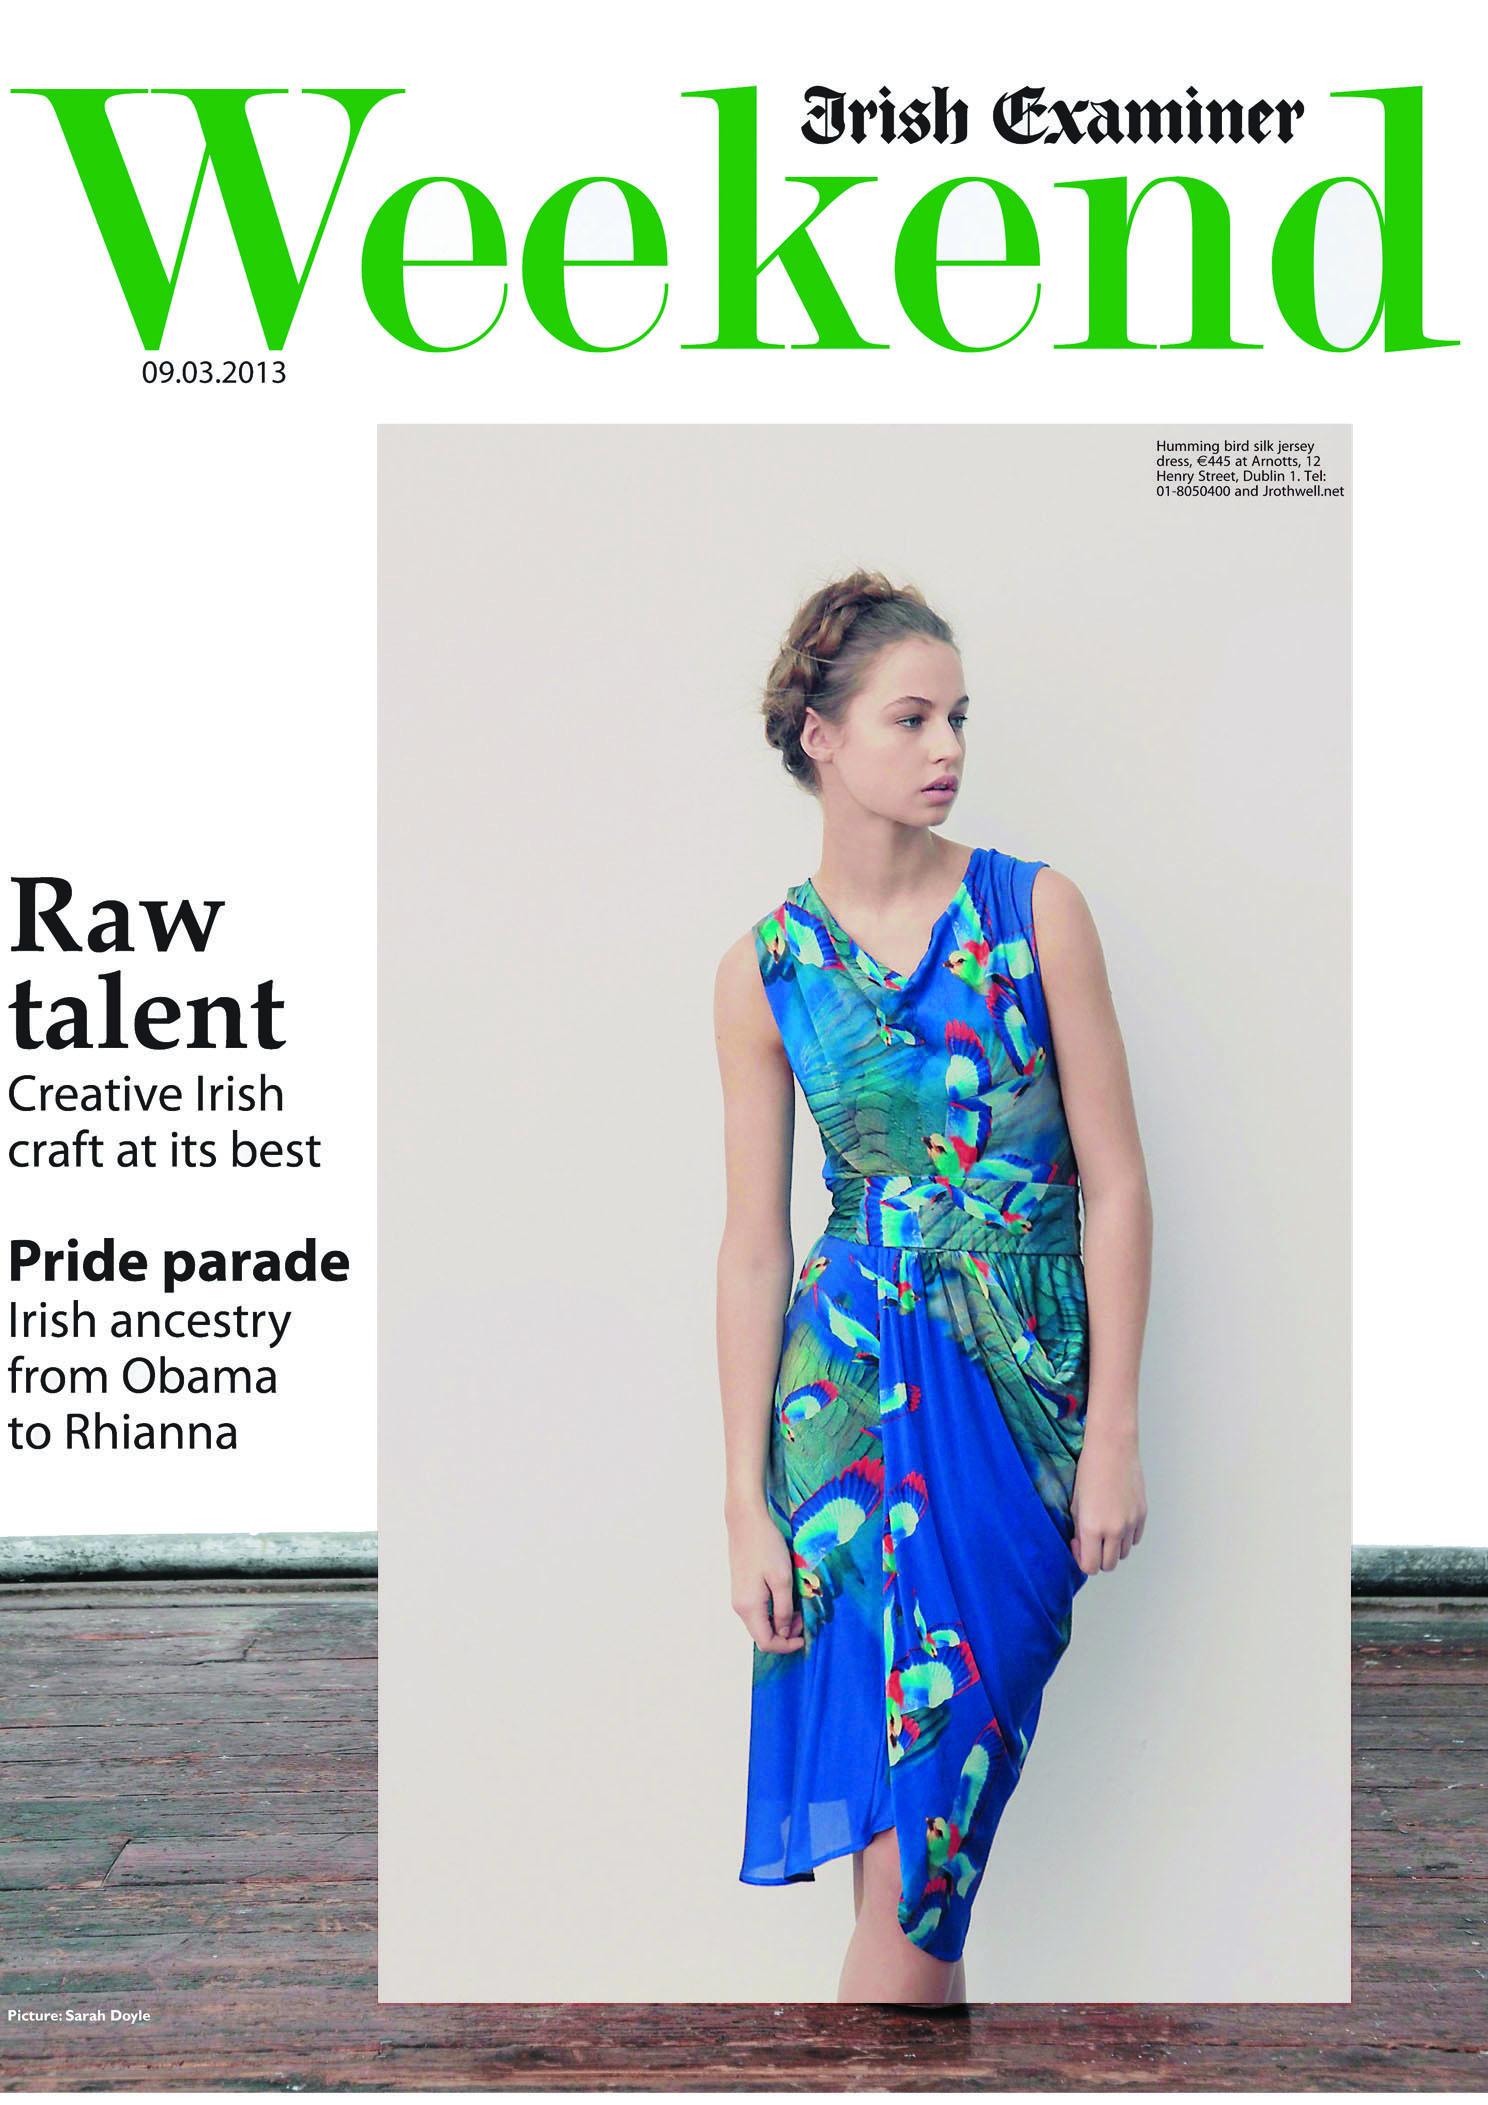 Irish Examiner Weekend, 9th March 2013